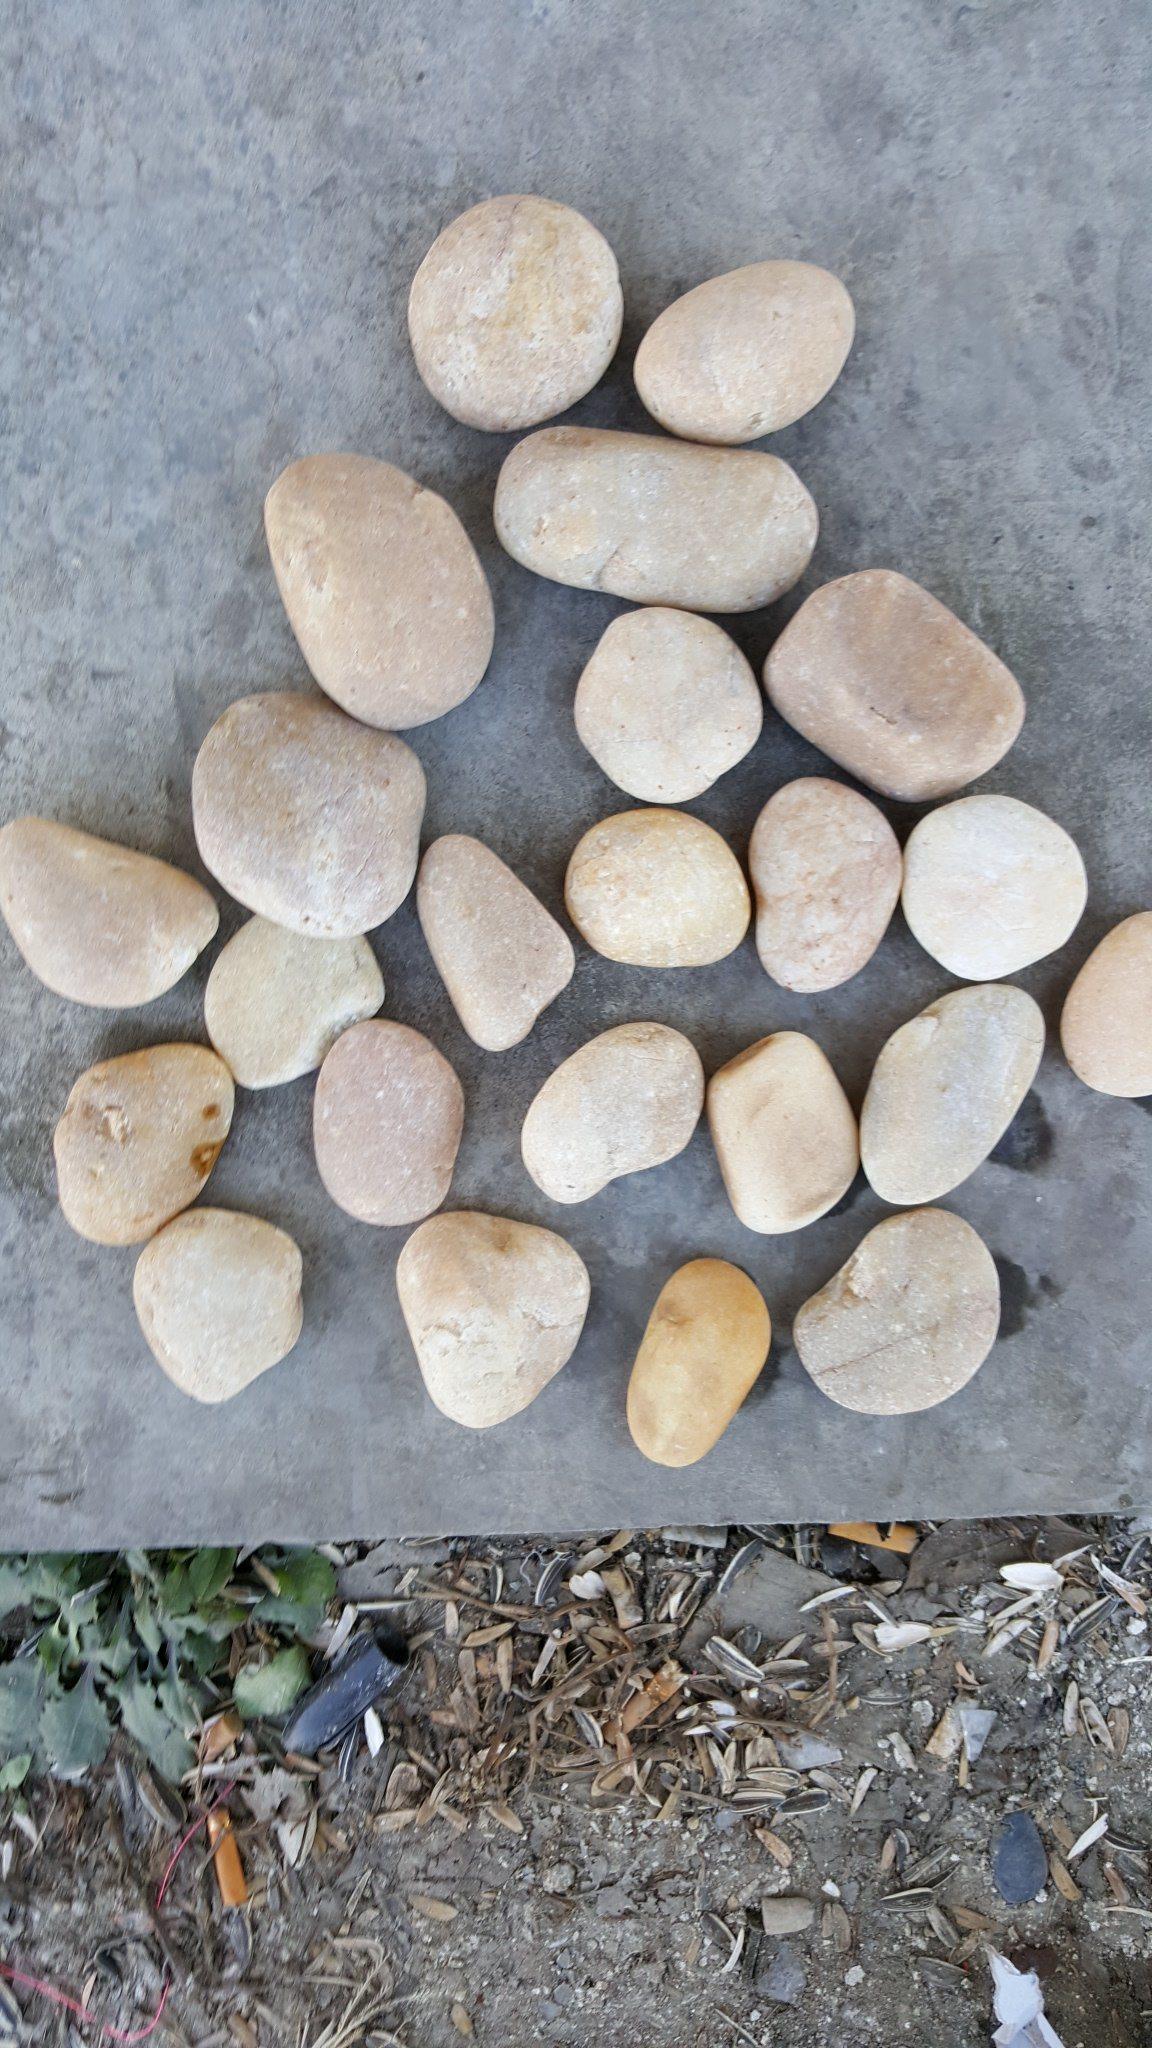 china stone pebbles granite marble supplier xiamen pebblesworld imp exp co ltd